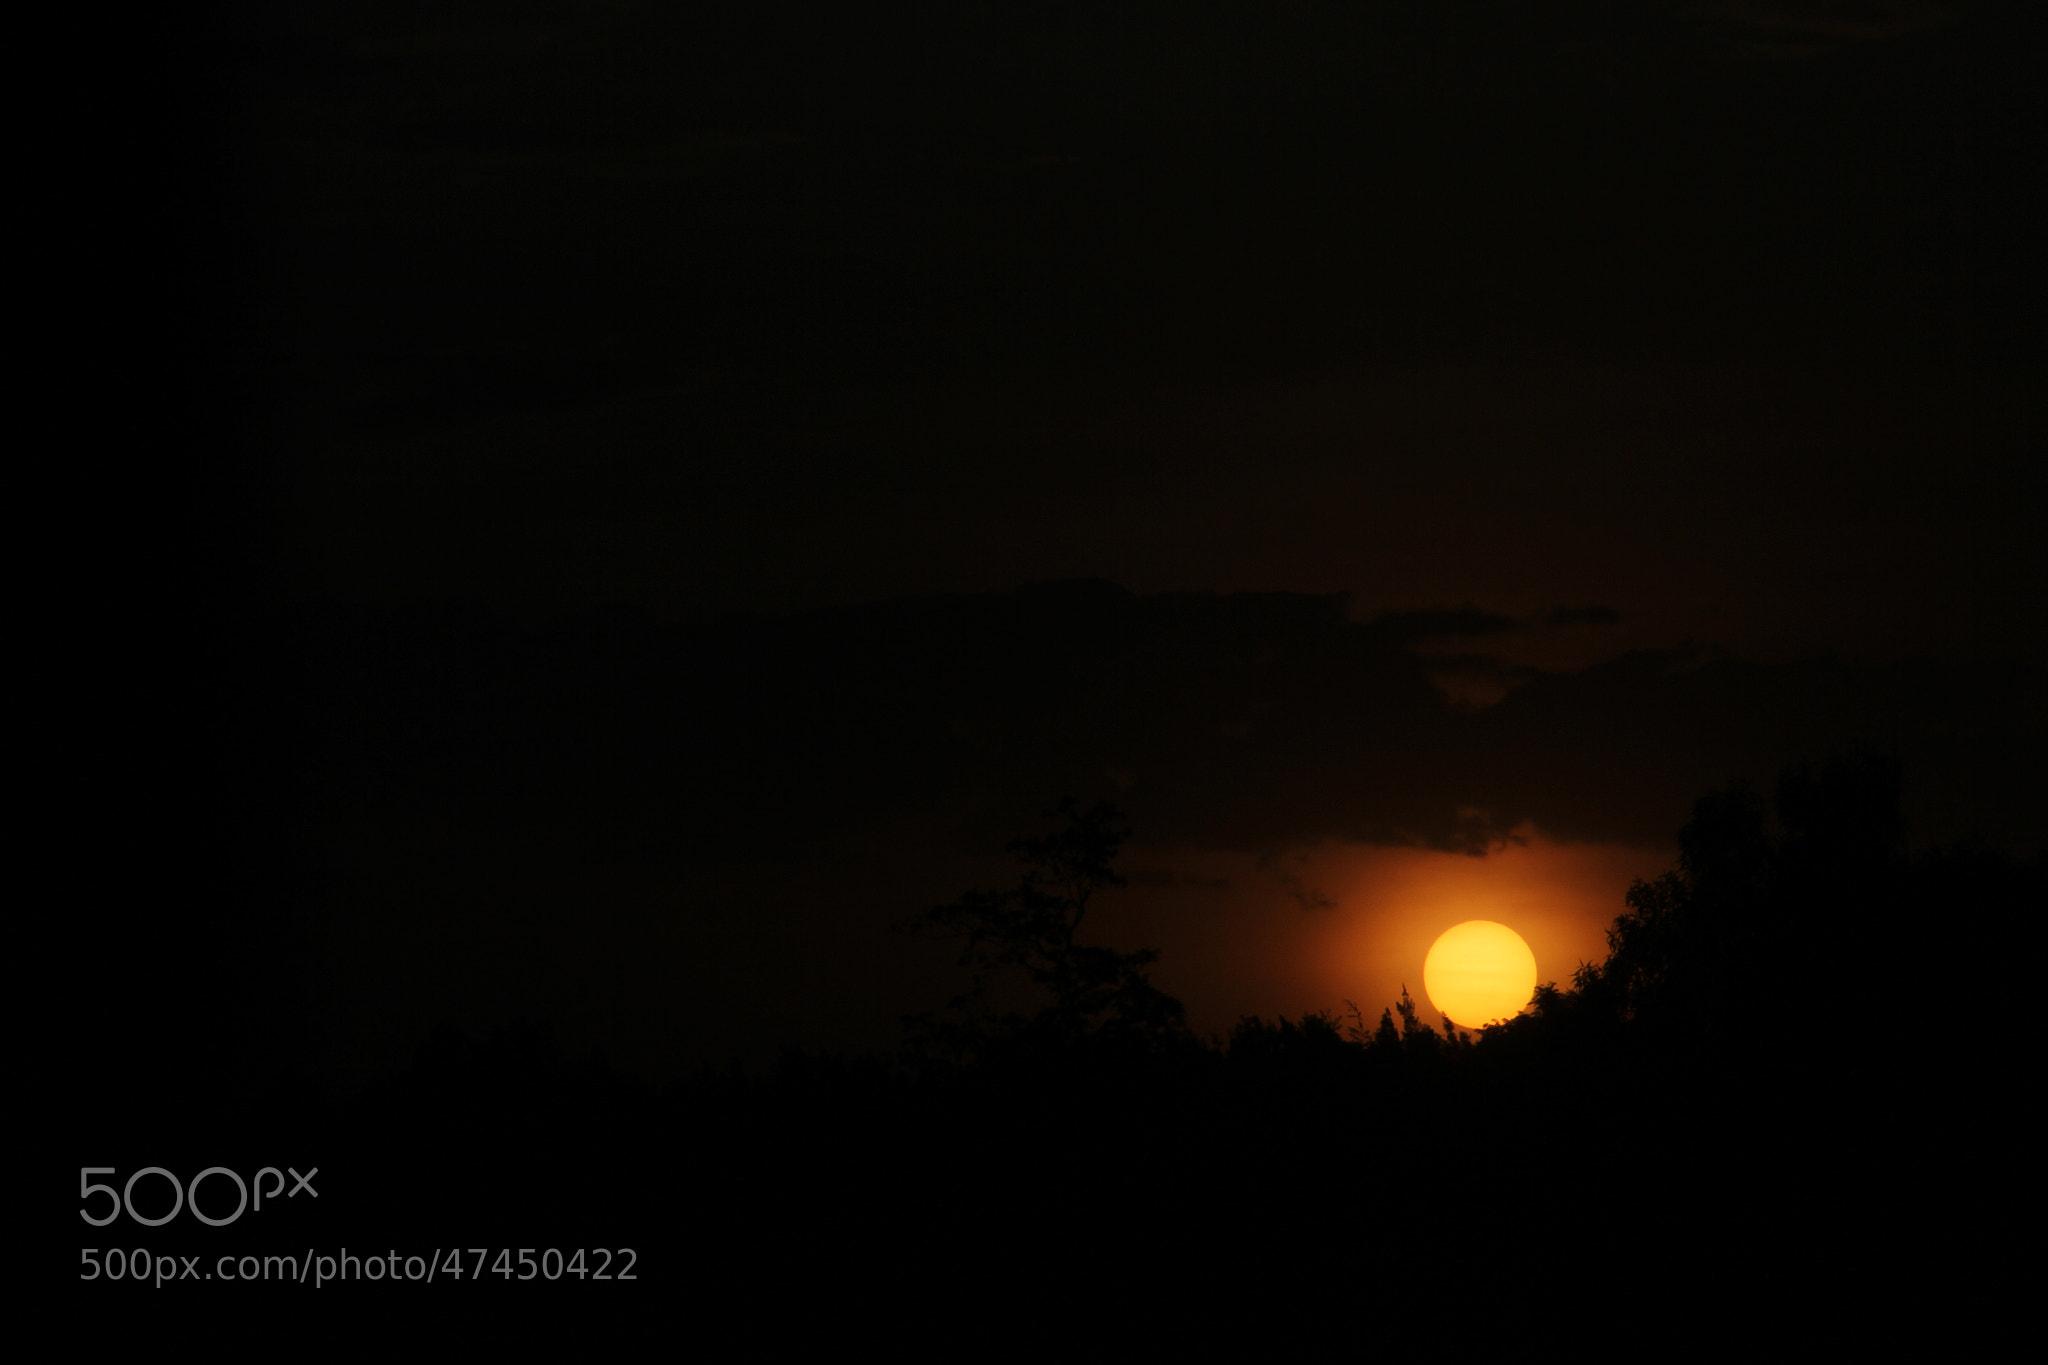 Photograph sunny side by wambuikisienya on 500px